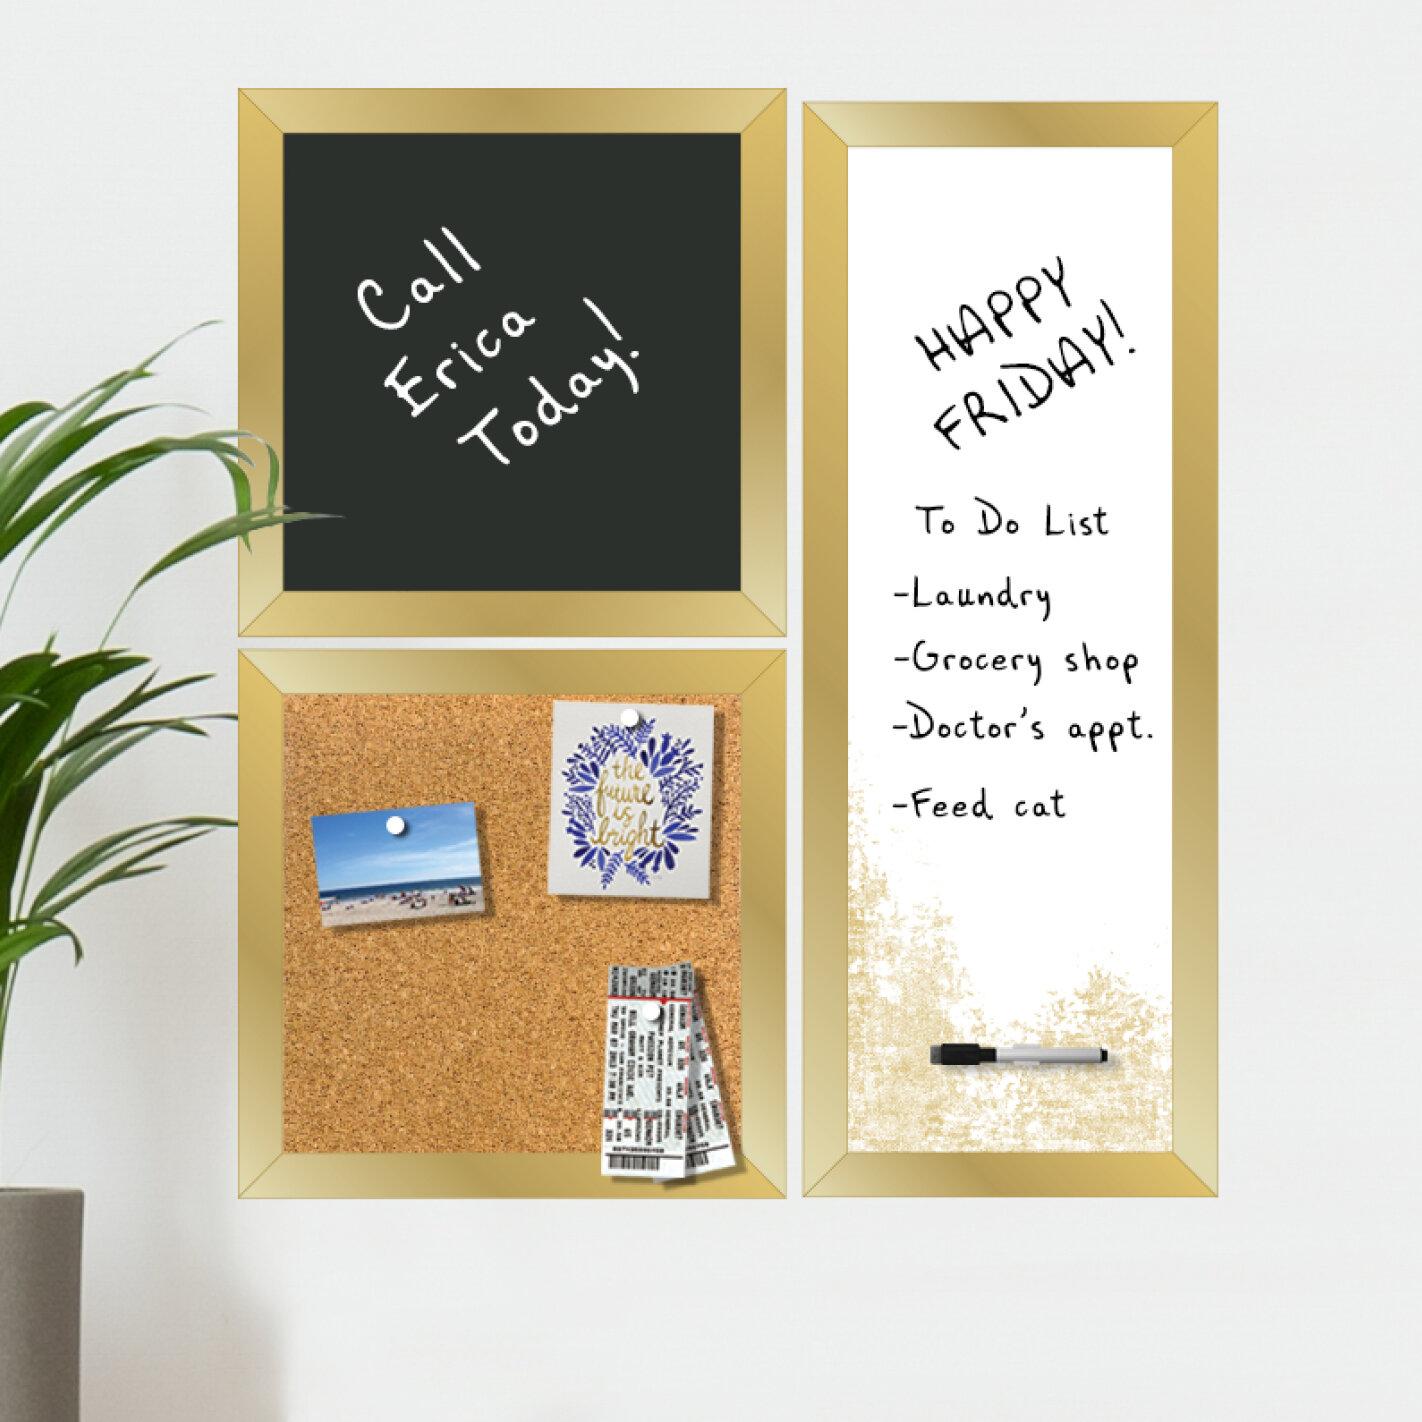 Ebern Designs 3 Piece Gallery Organizer Organization Magnetic Wall Mounted Combo Board Set Reviews Wayfair